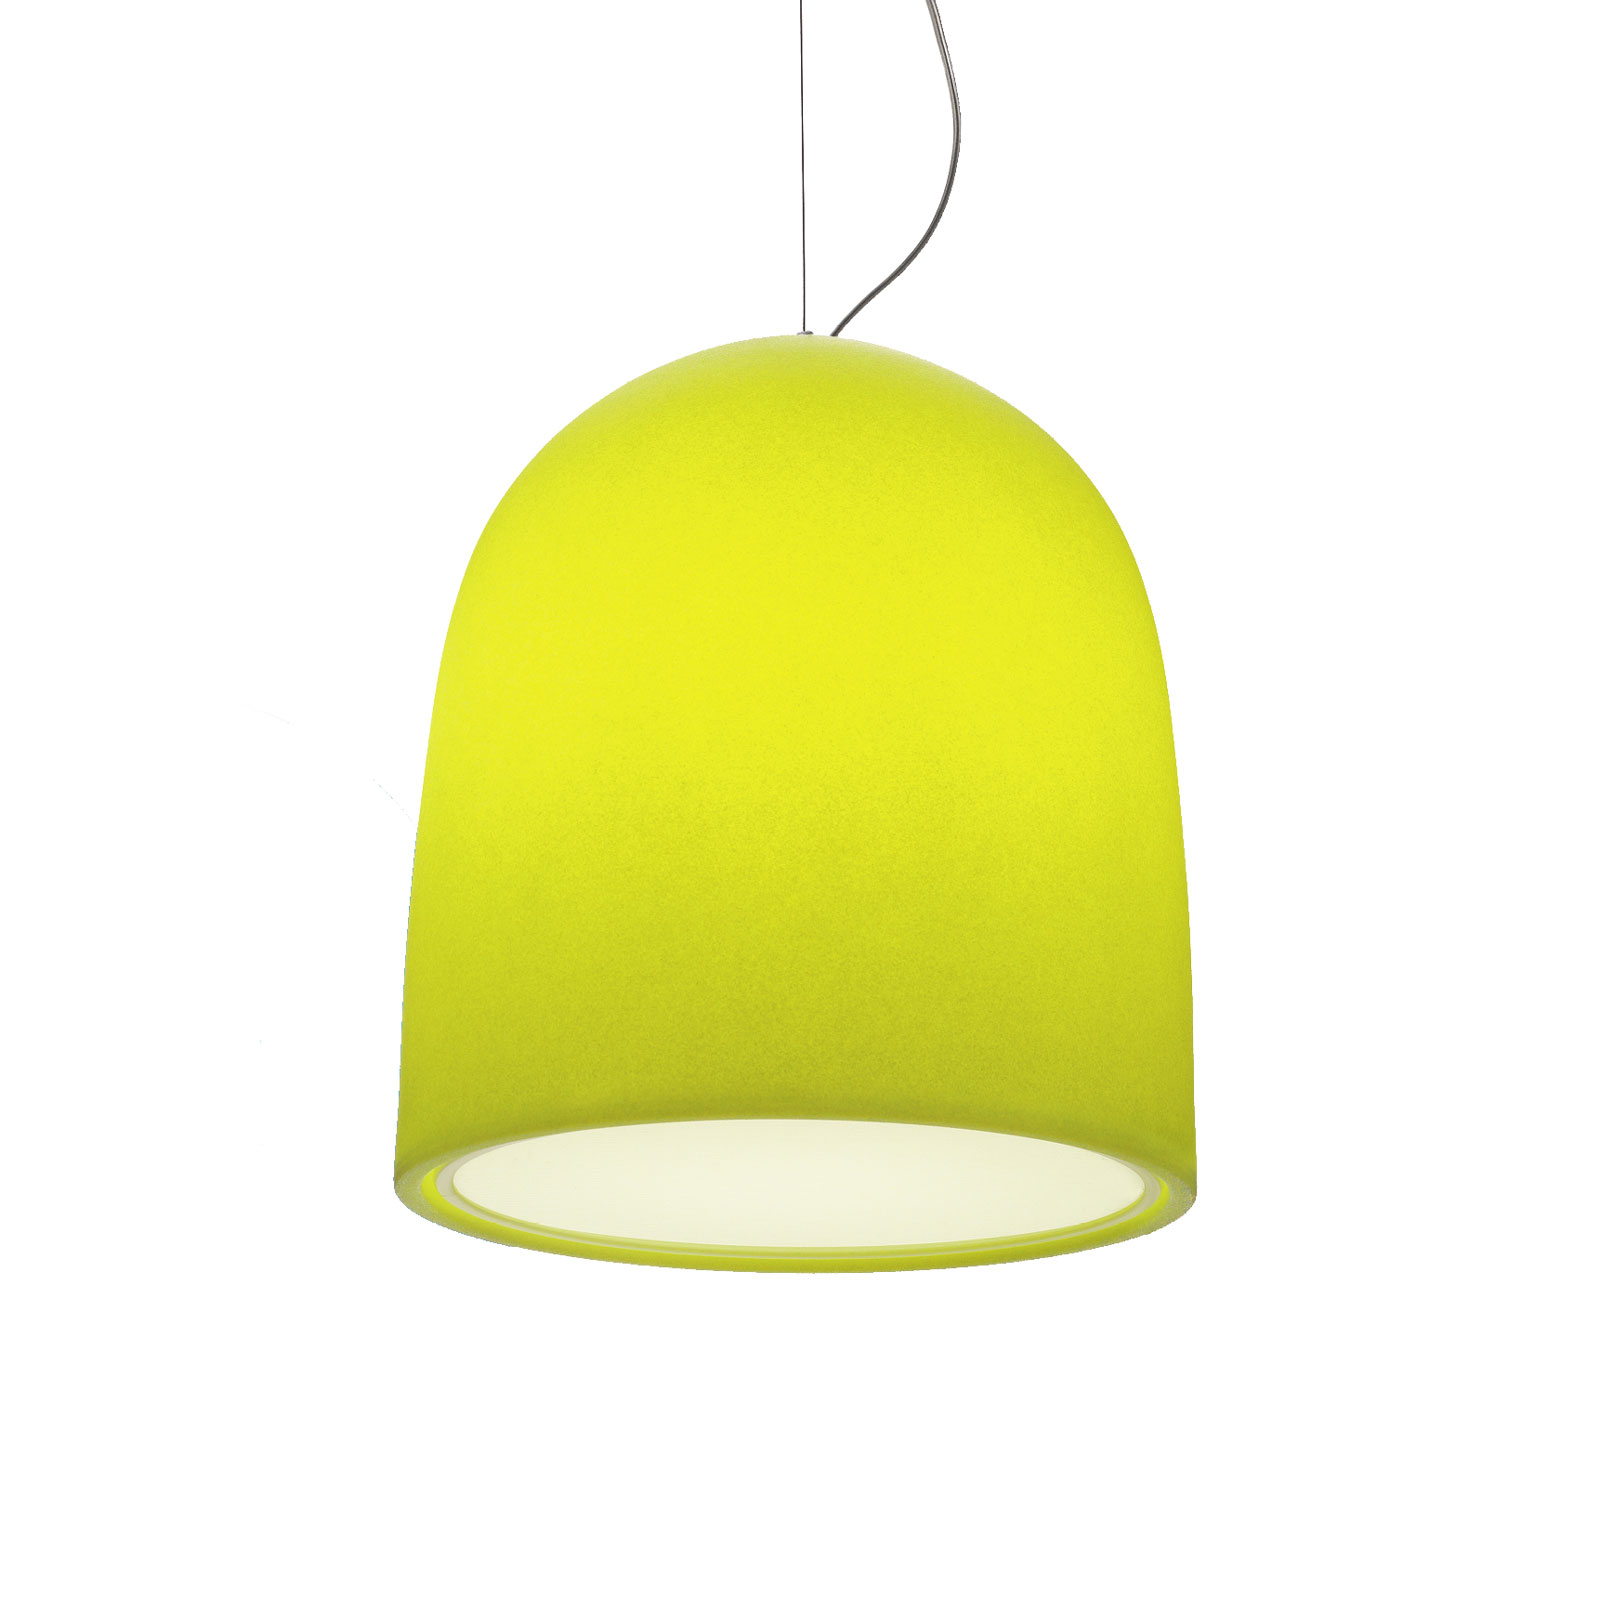 Modo Luce Campanone Hanglamp Ø 33 cm limone